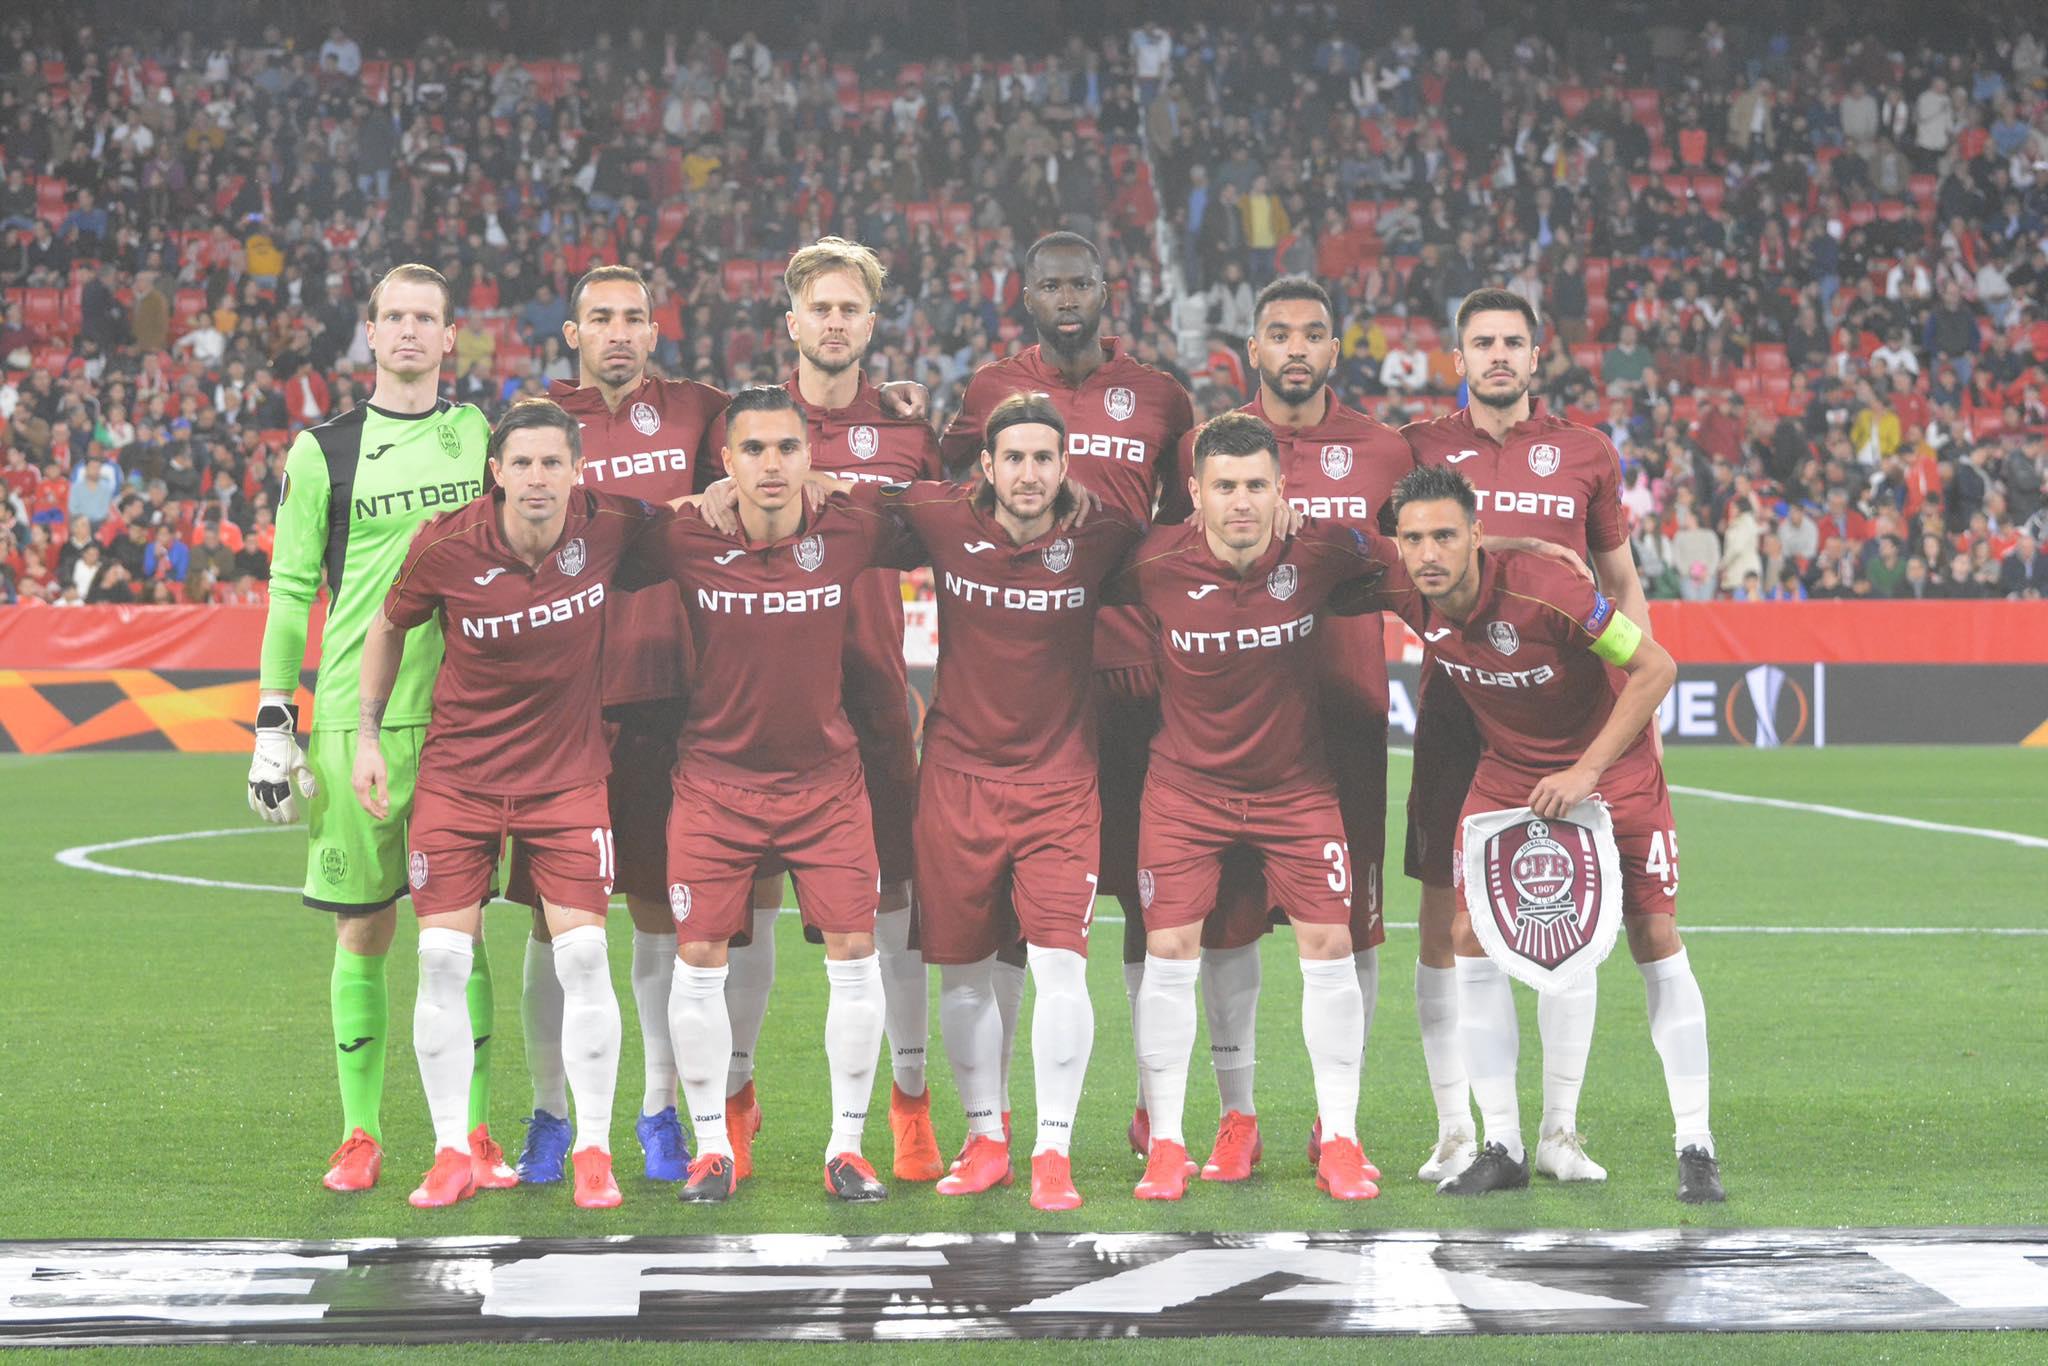 FOTO: Lucian Danciu / Sevilla - CFR Cluj